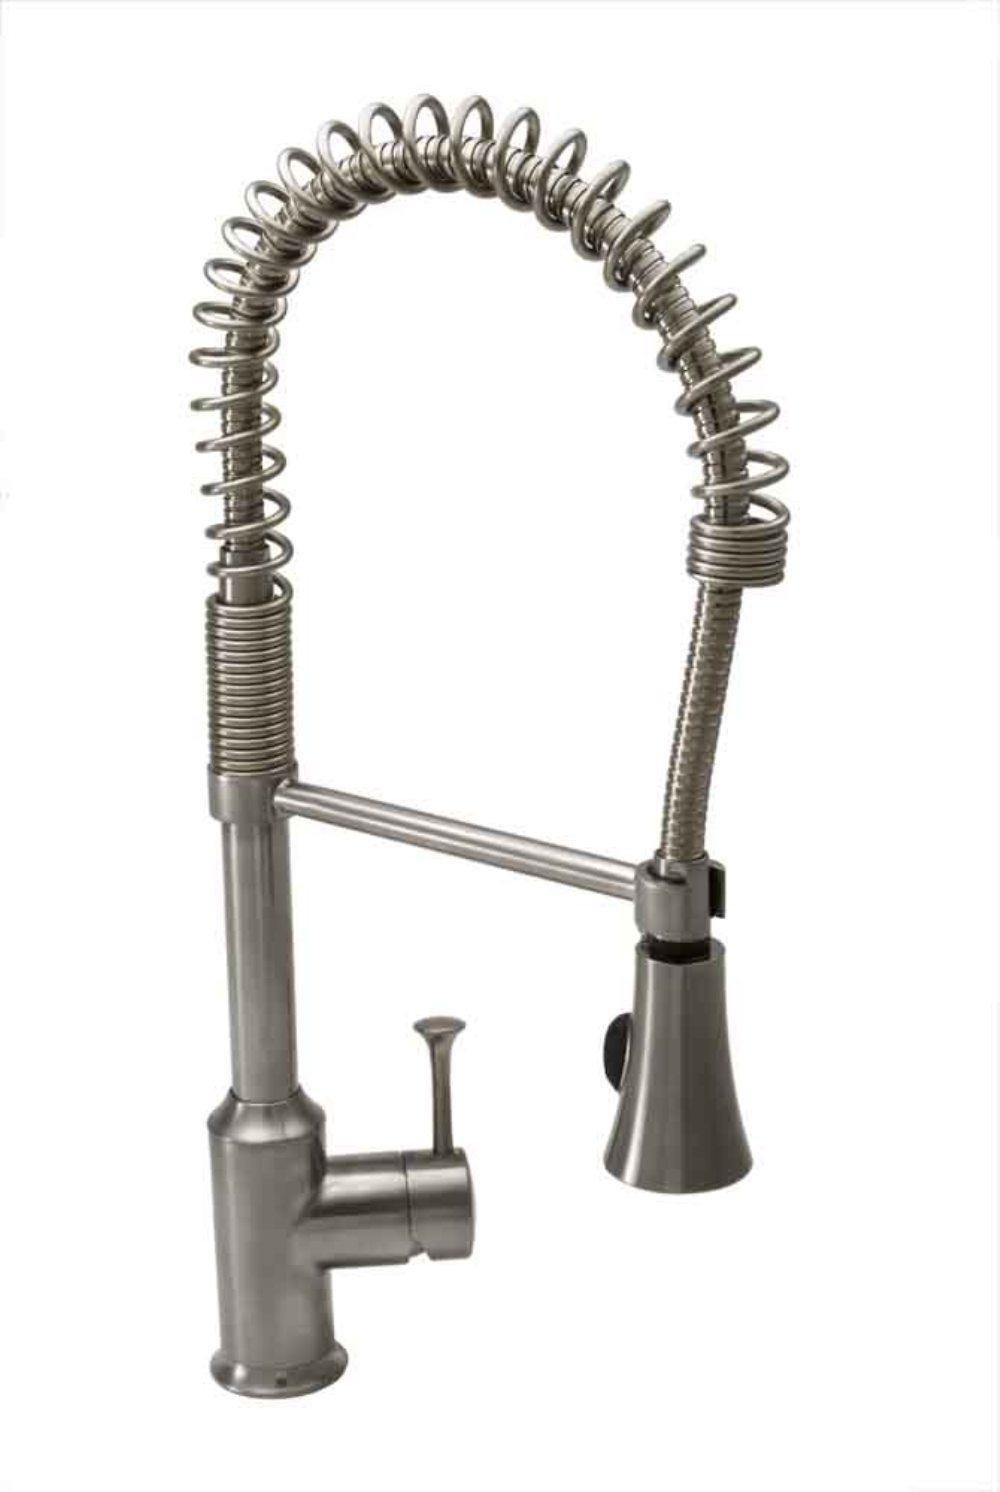 American Standard 4332.350.075 Pekoe Semi-Professional Single Control Kitchen Faucet, Stainless Steel